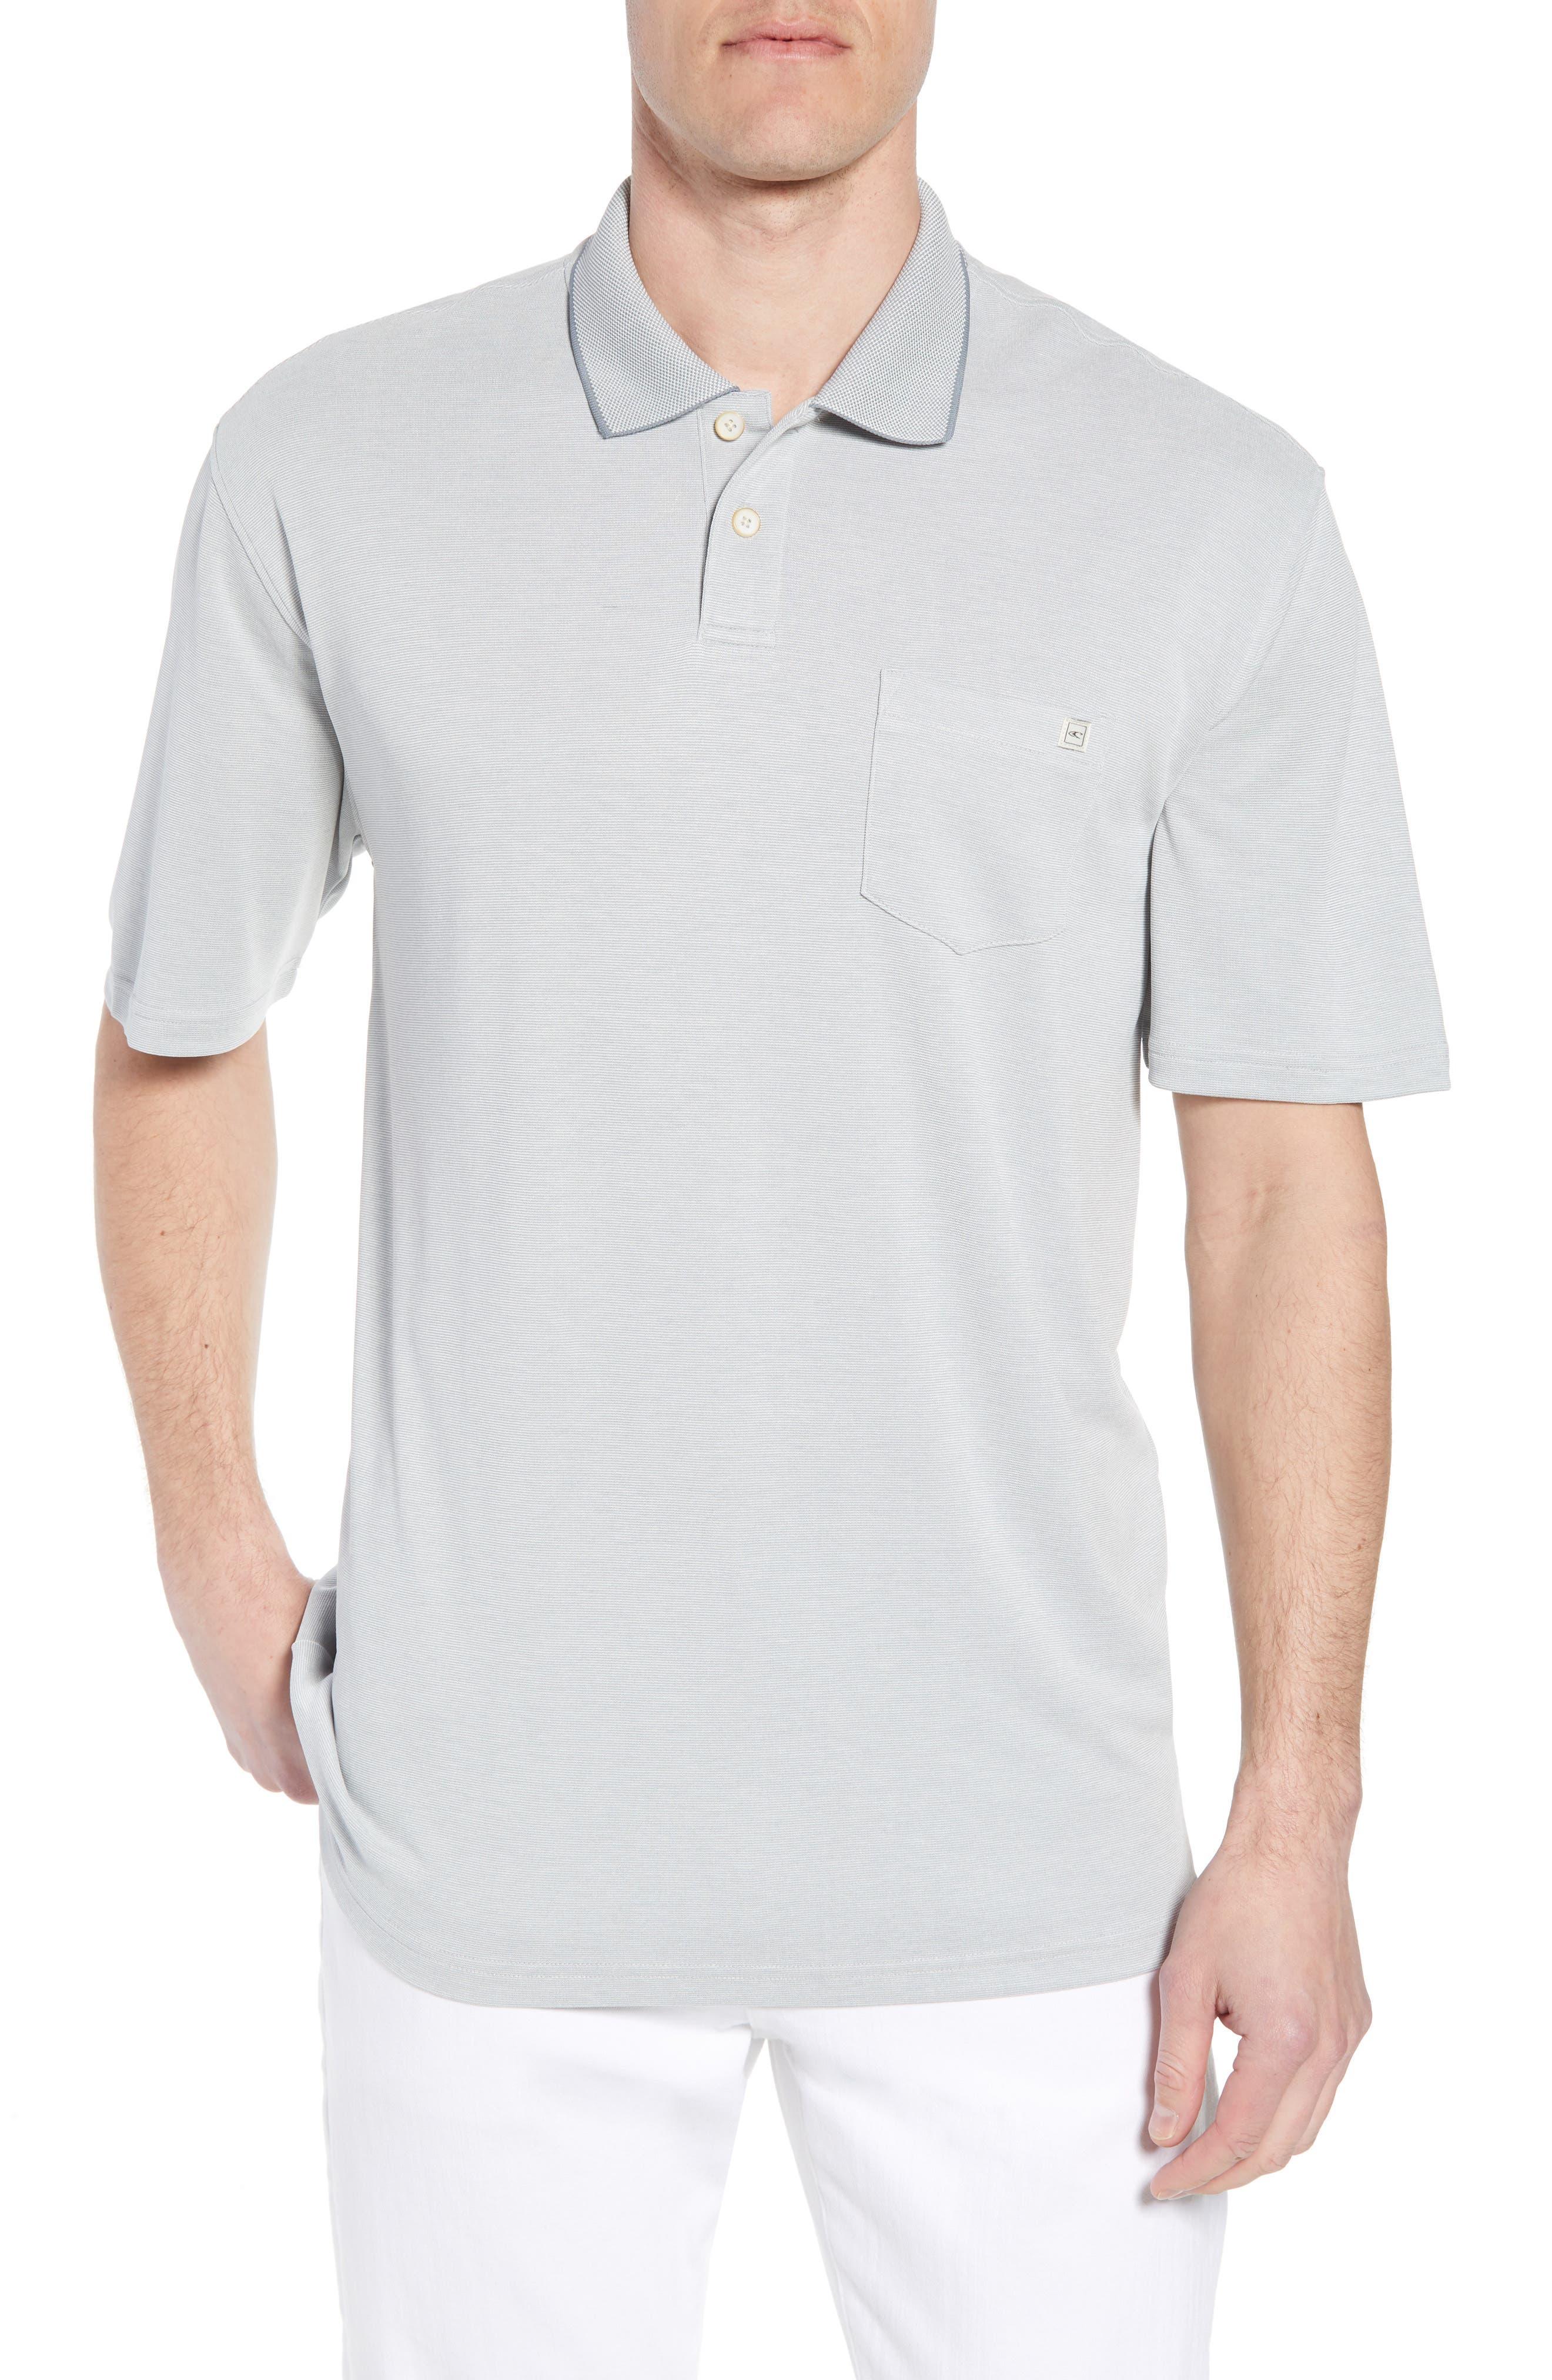 Gaviota Polo,                         Main,                         color, Light Grey